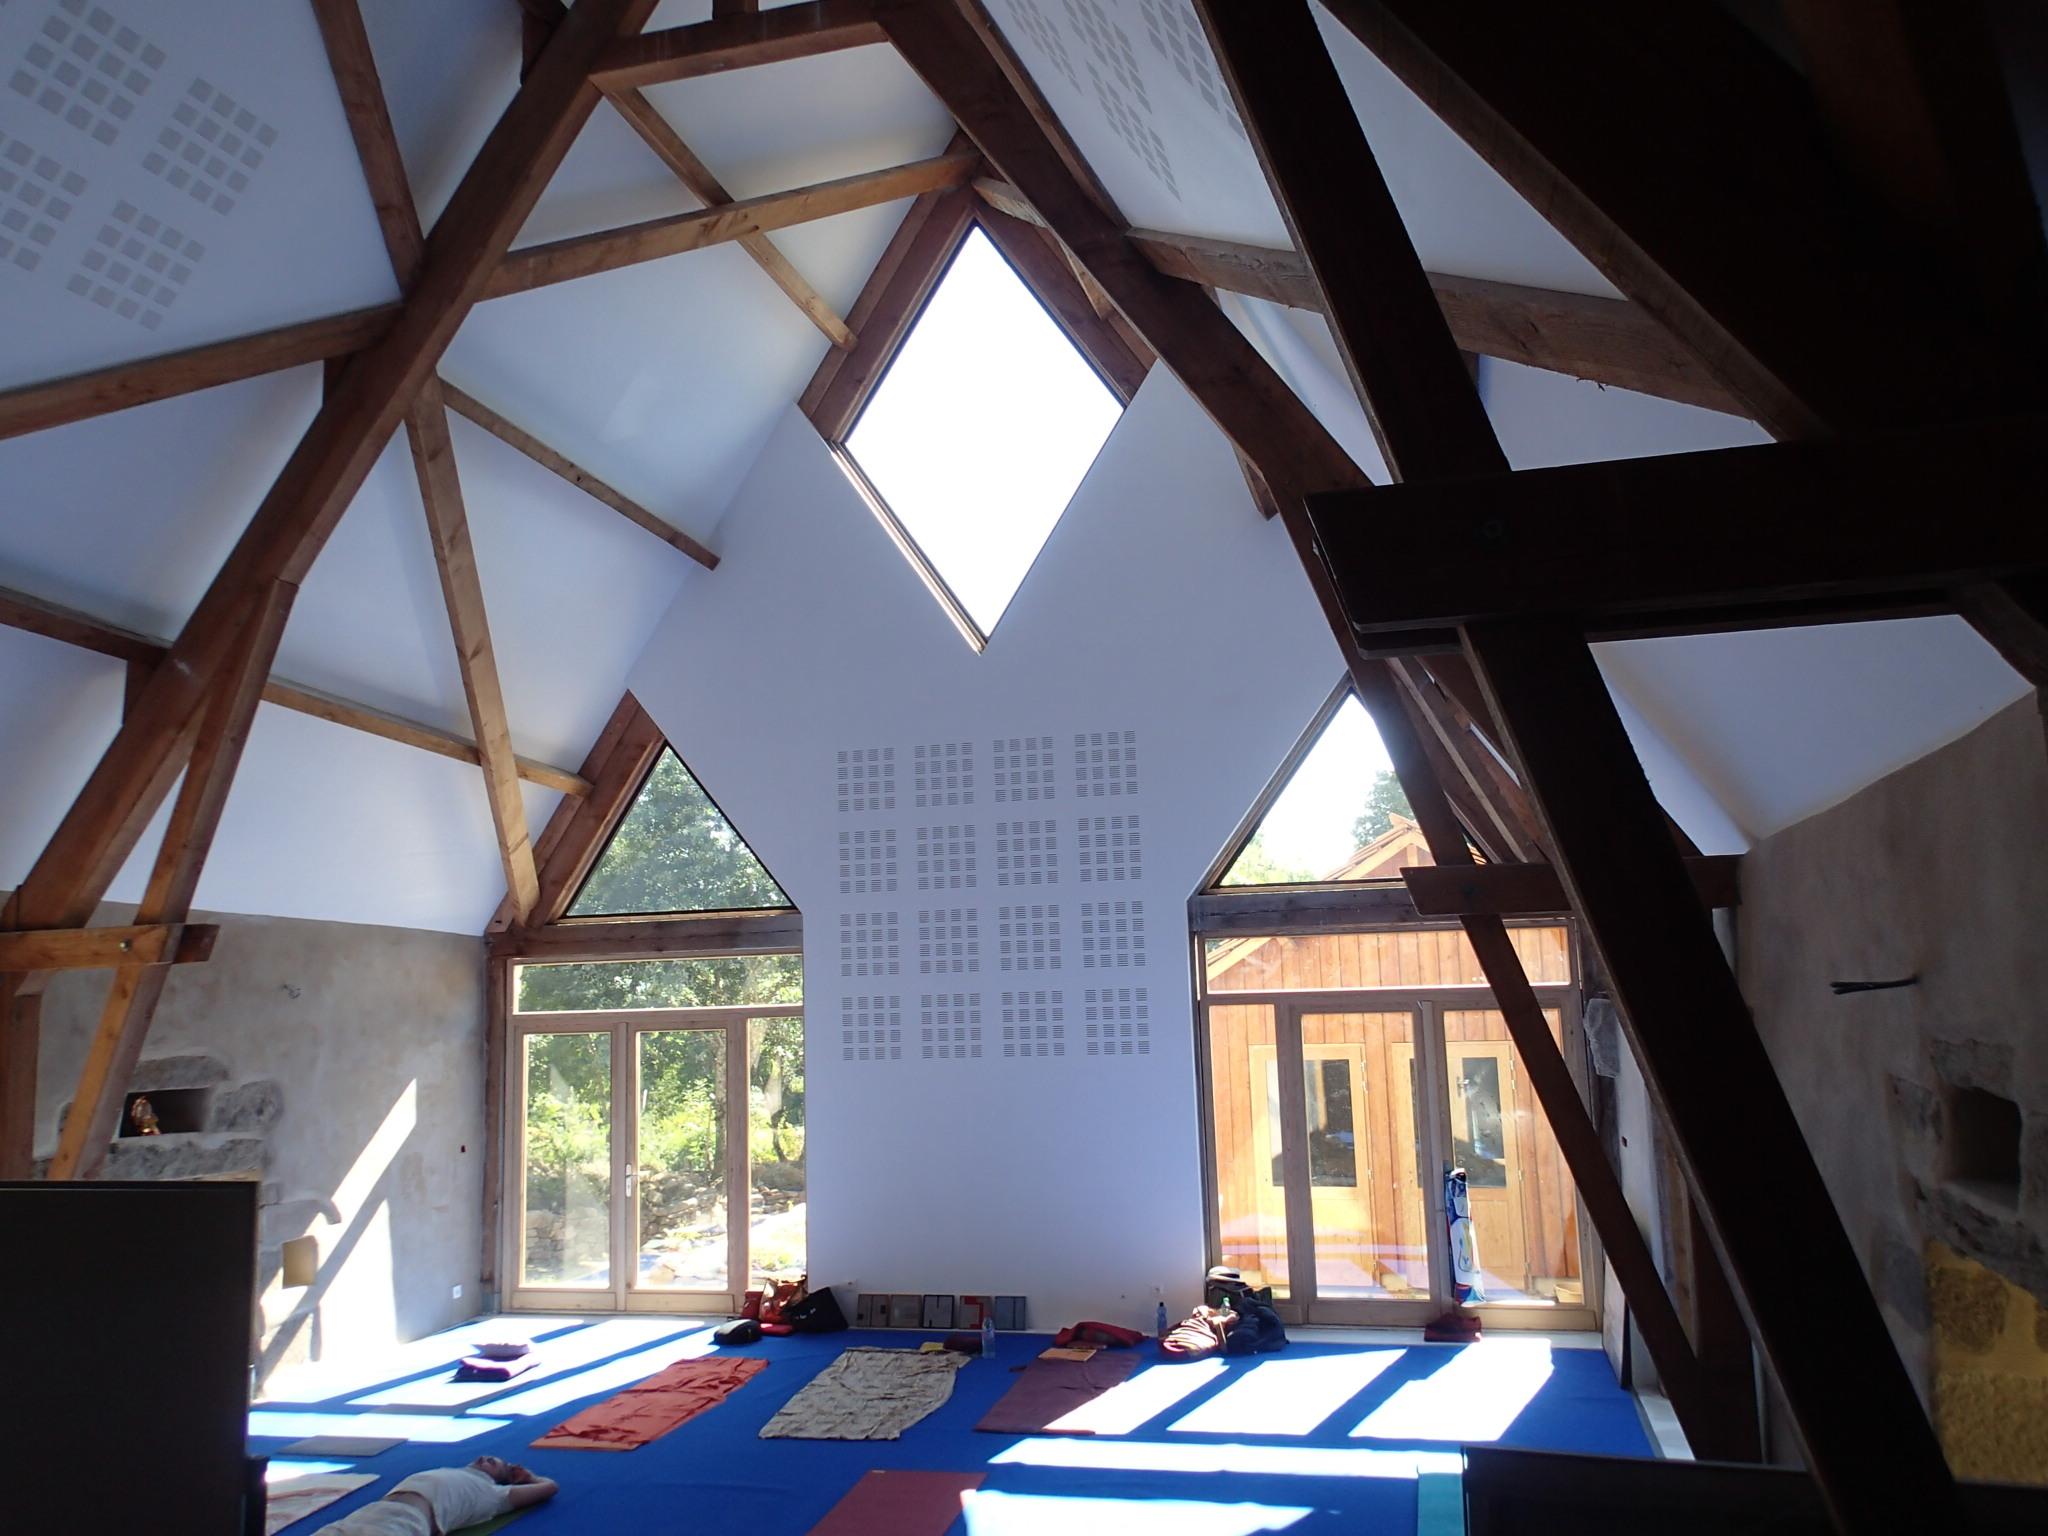 lieux Meyrignac l'Eglise